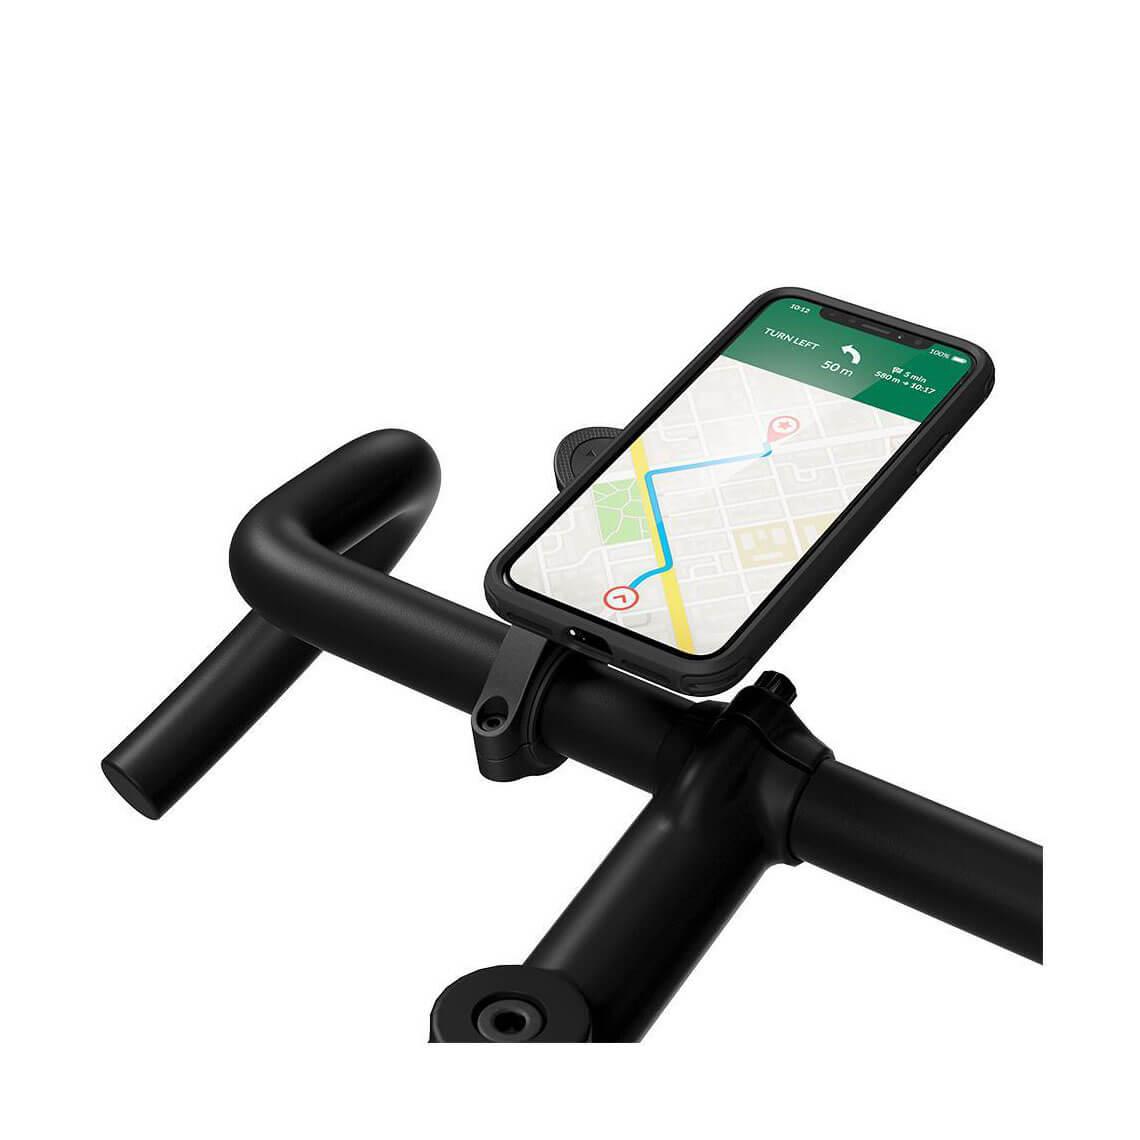 نگهدارنده گوشی اسپیگن مدل Gearlock MF10 مناسب دوچرخه